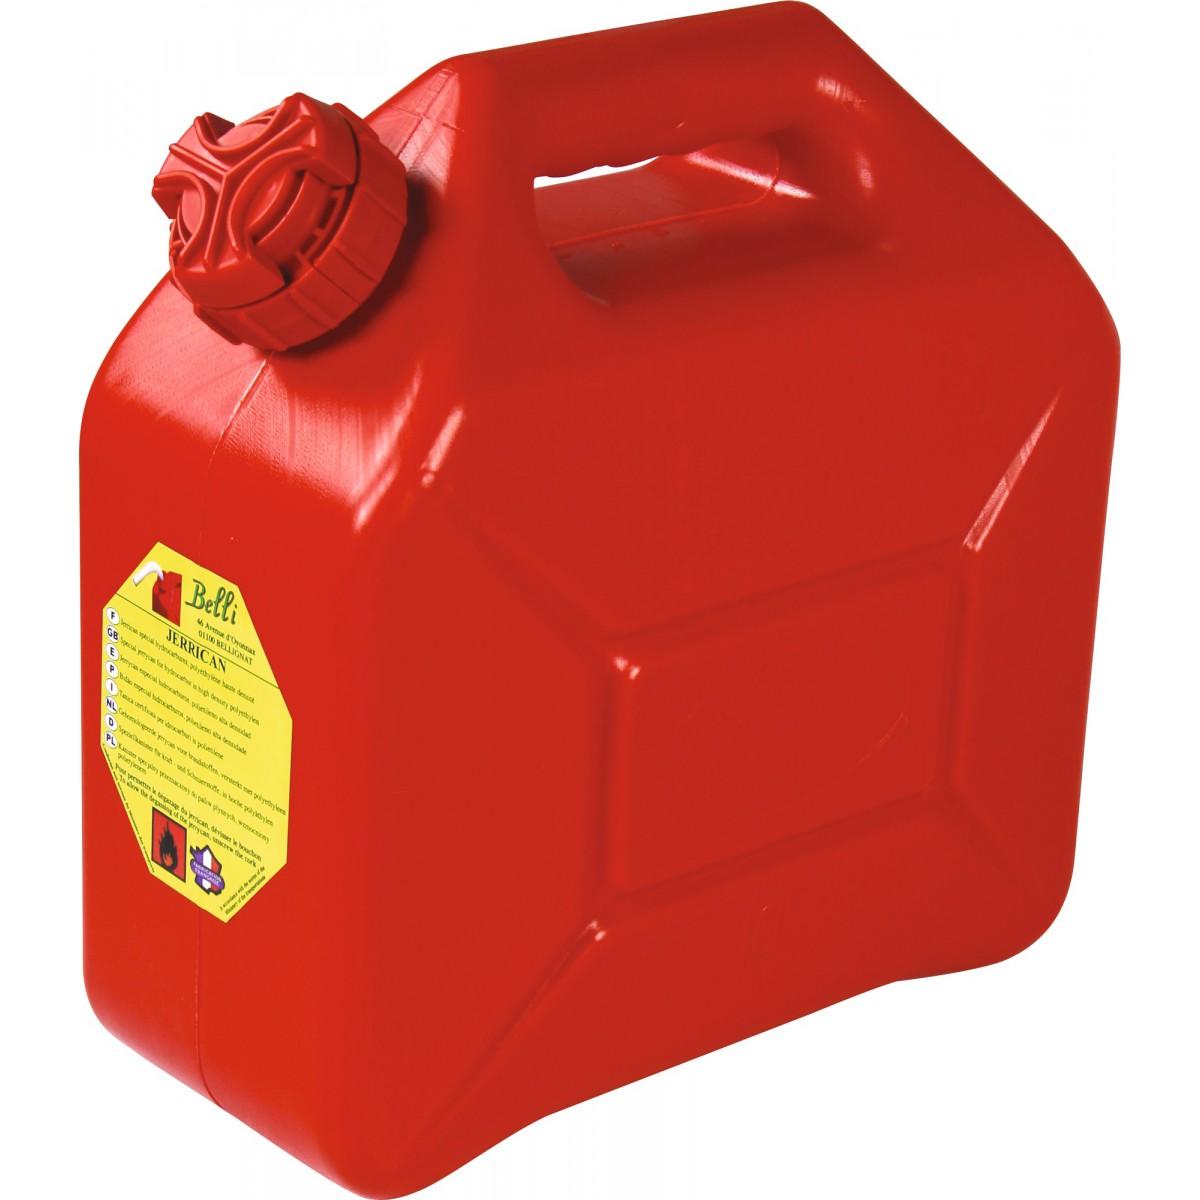 Jerrican hydrocarbure bec verseur Bellijardin - 10 l